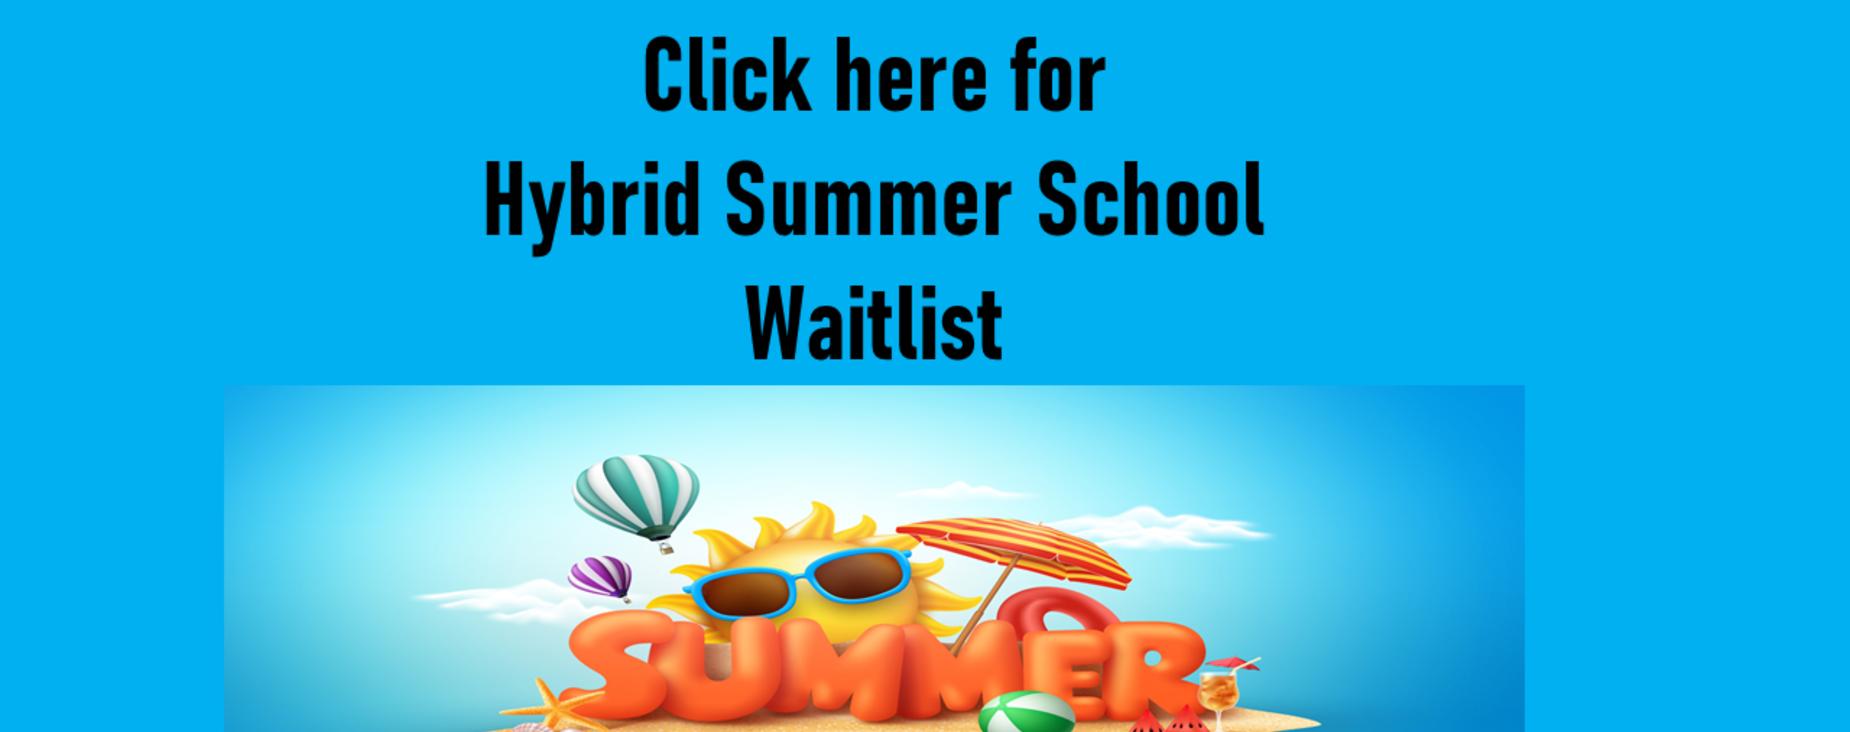 Summer School Waitlist